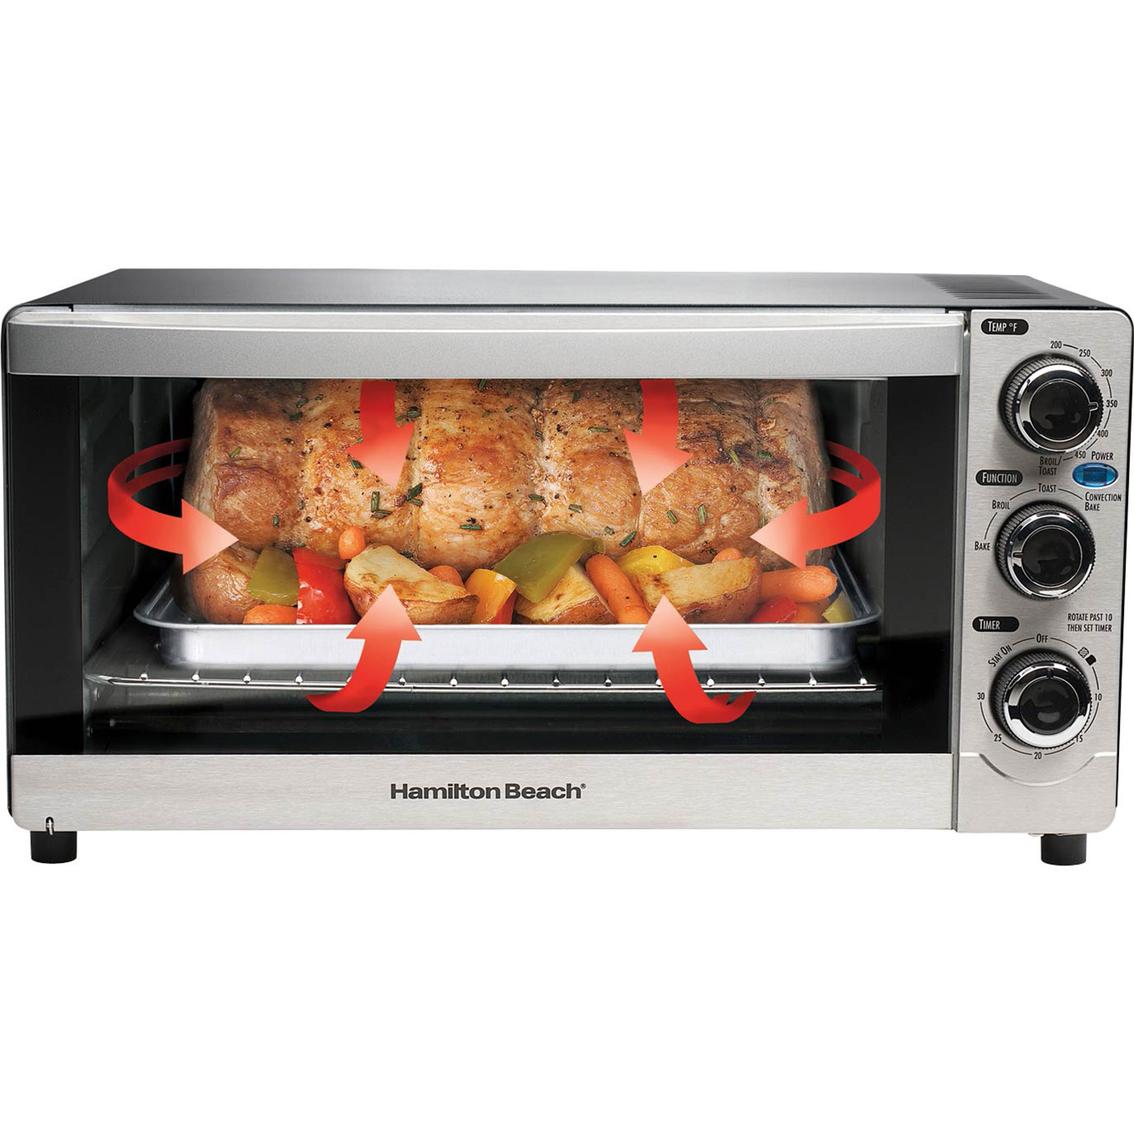 Hamilton beach cool touch 6 slice toaster oven toasters - Cool touch exterior convection toaster oven ...